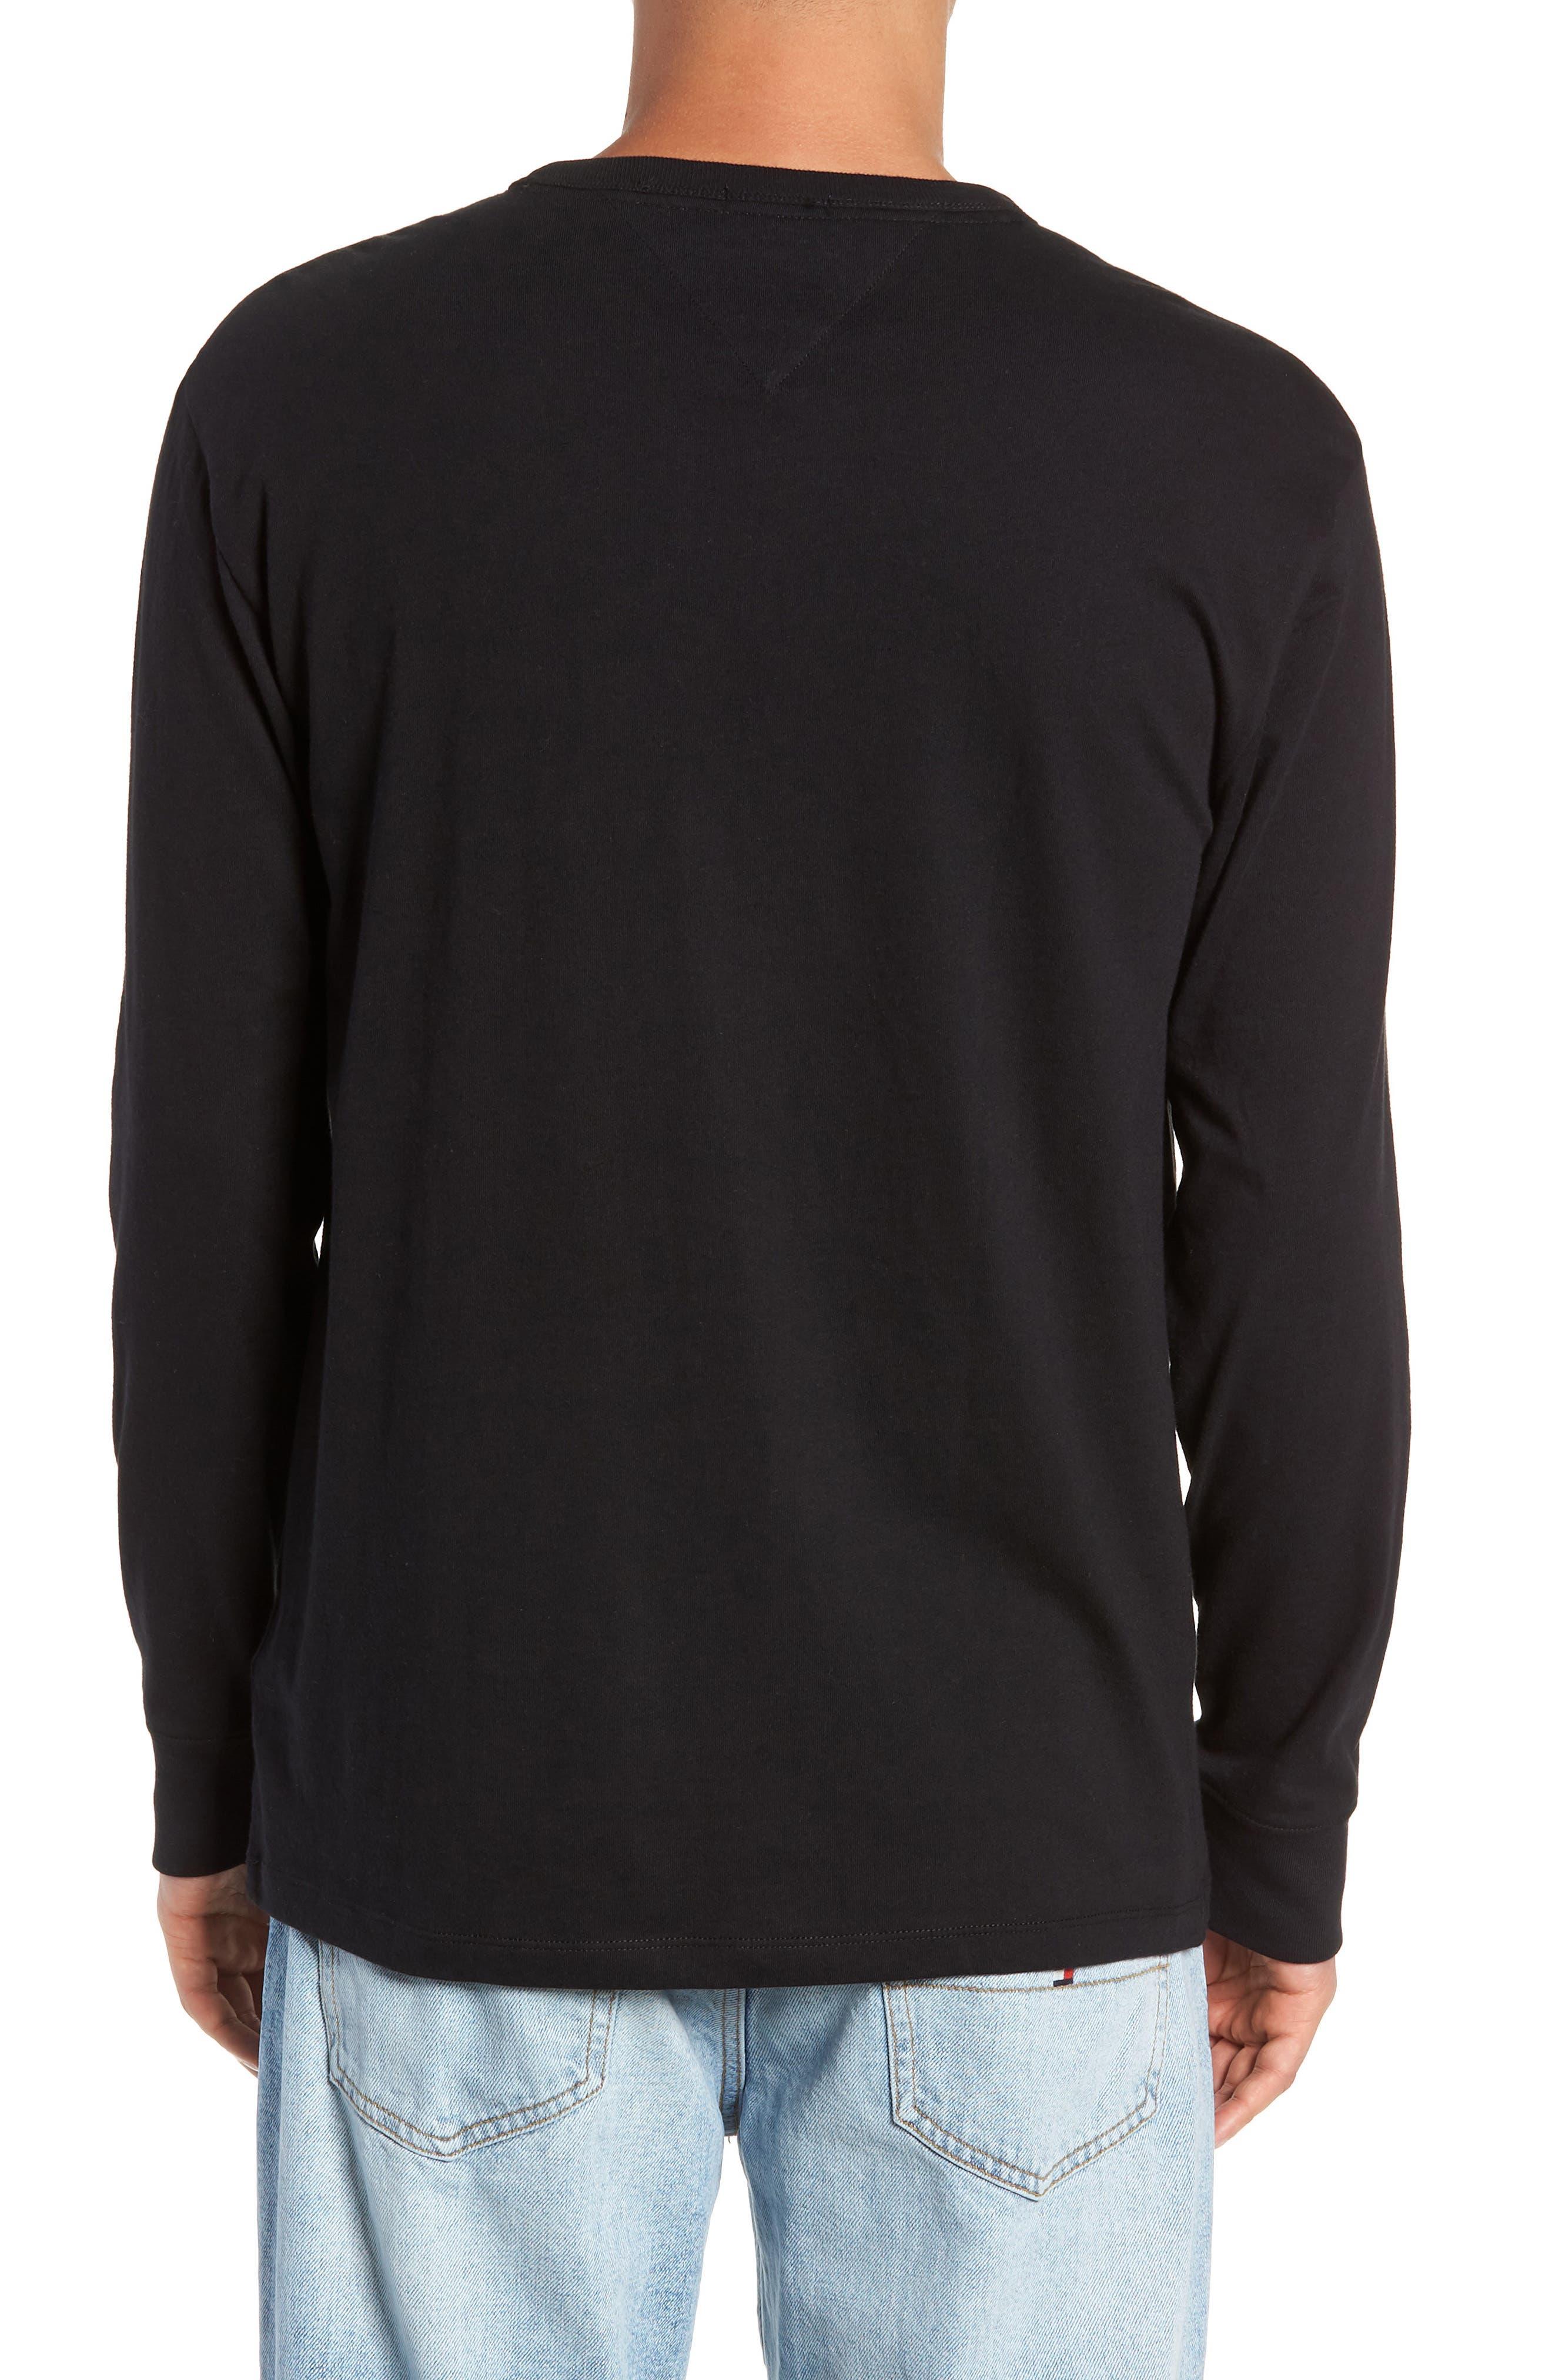 TOMMY JEANS,                             TJM Logo Graphic Long Sleeve T-Shirt,                             Alternate thumbnail 2, color,                             001